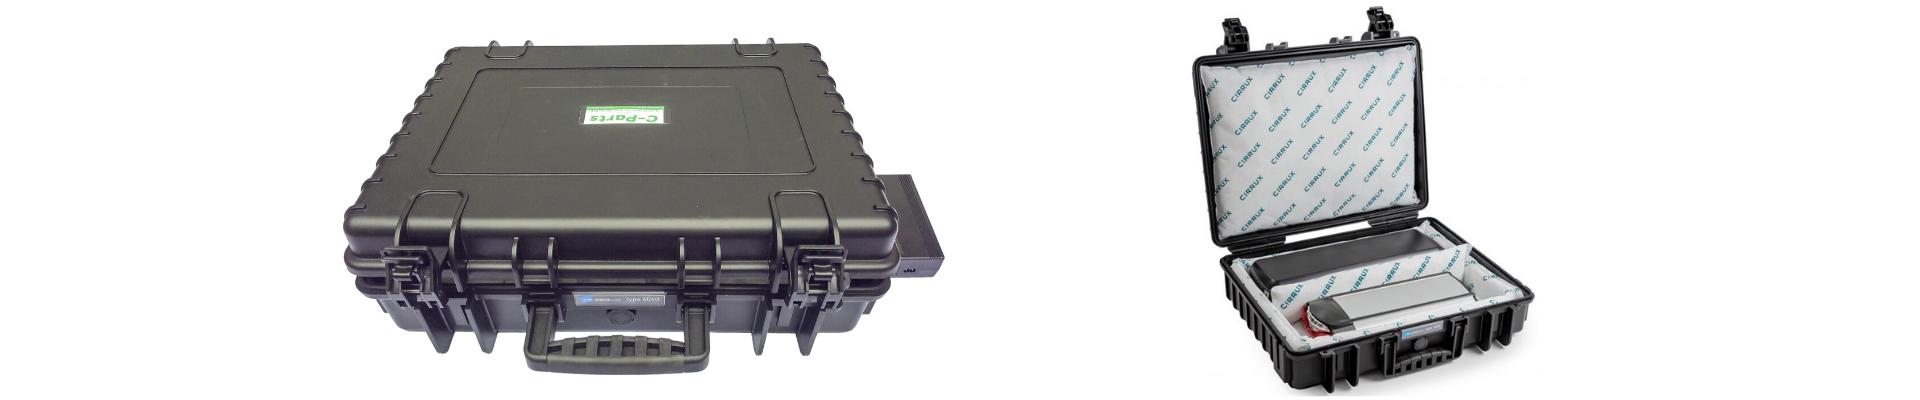 Slider C-Parts Accu veiligheidskoffer